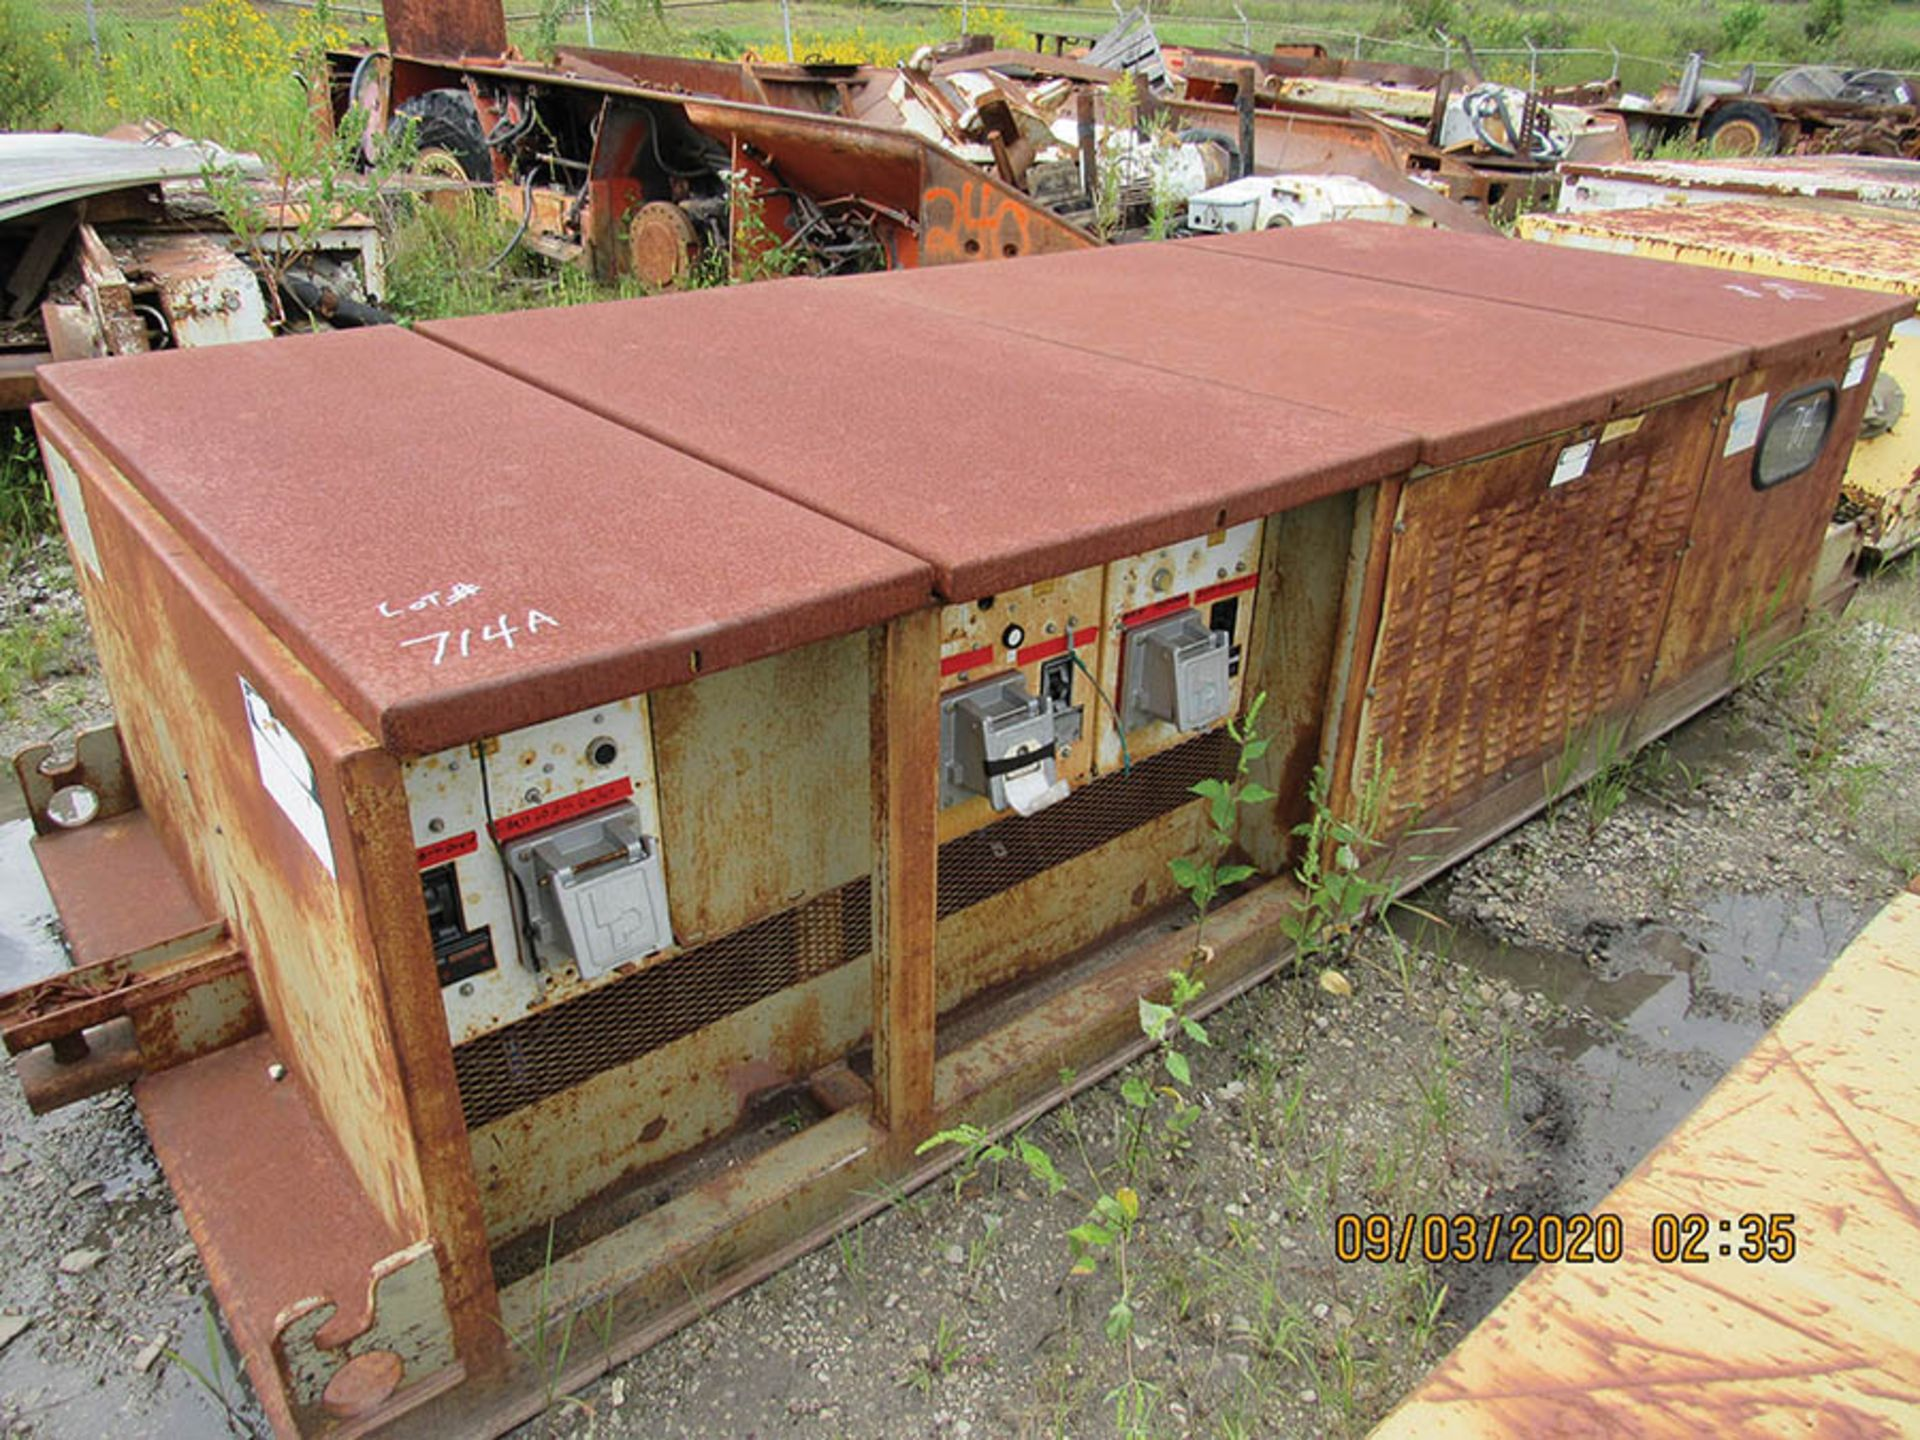 Lot 714A - LINE POWER CO. MODEL 300PBC POWER CENTER, S/N 8814, INPUT 12470 VAC 30.60HZ AC OUTPUT 480 VAC.30.